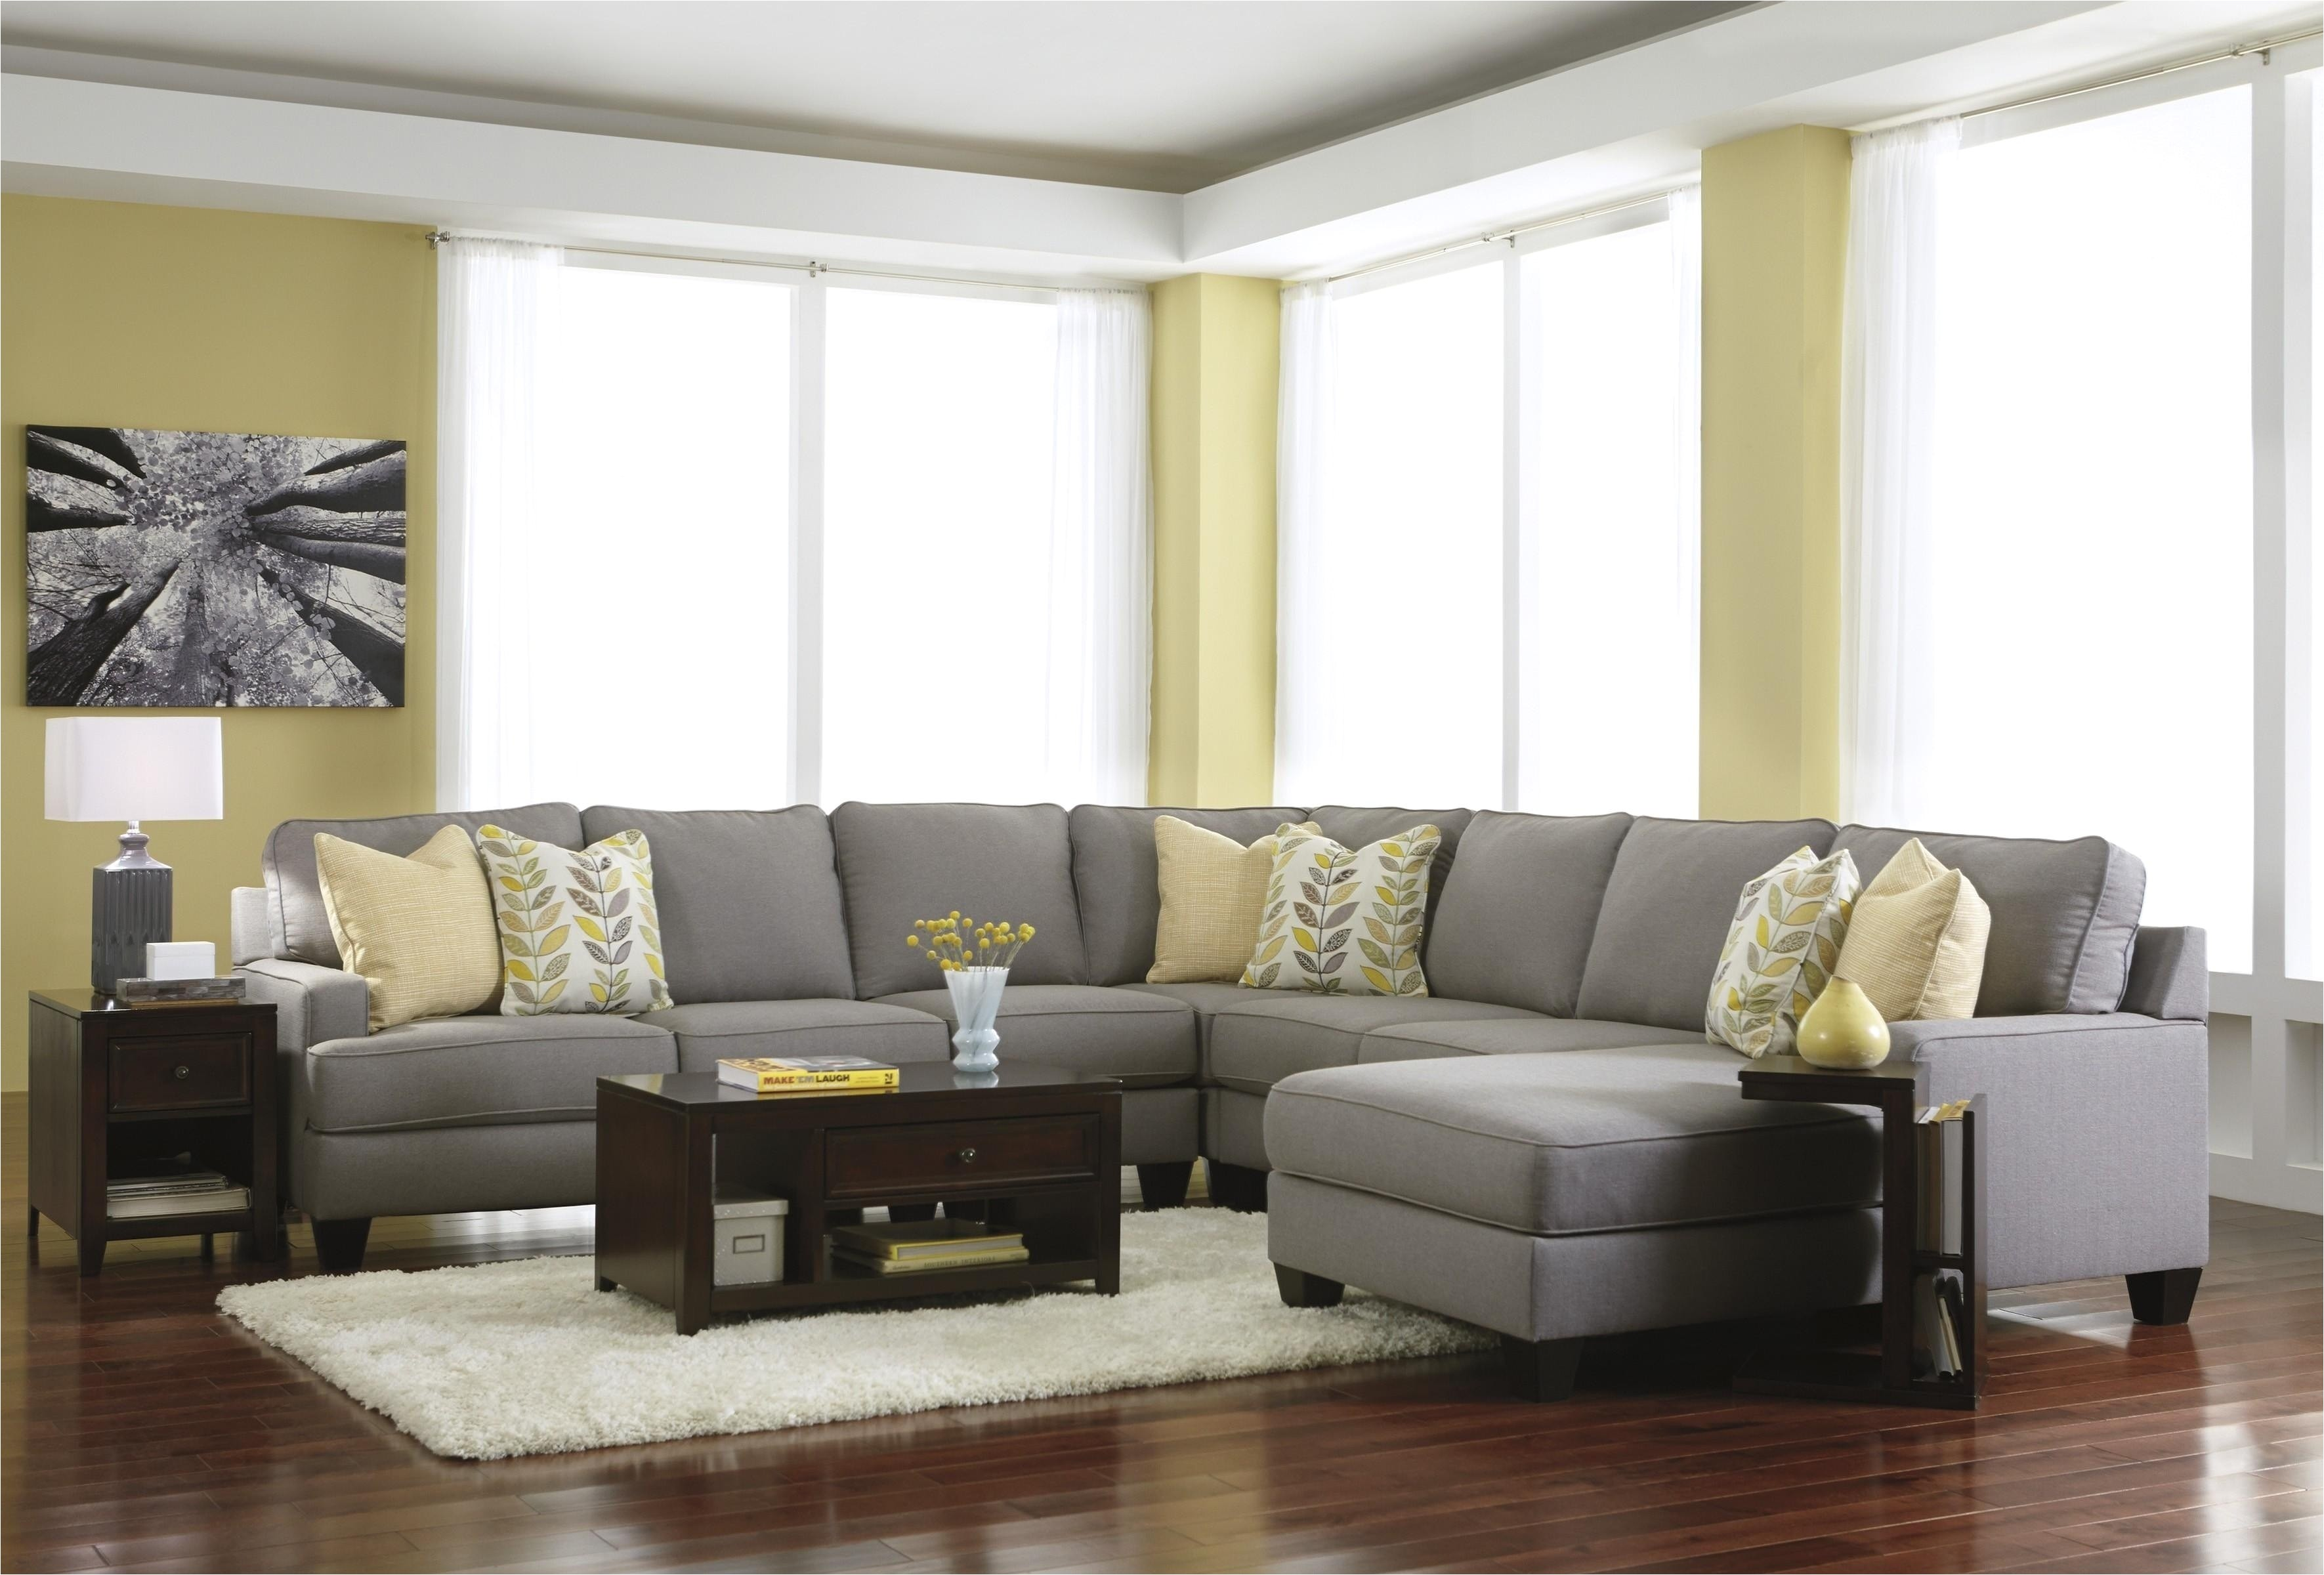 italian design franco sectional sofa luxury classic italian sofas best sofa italian sofas italian sofas 0d